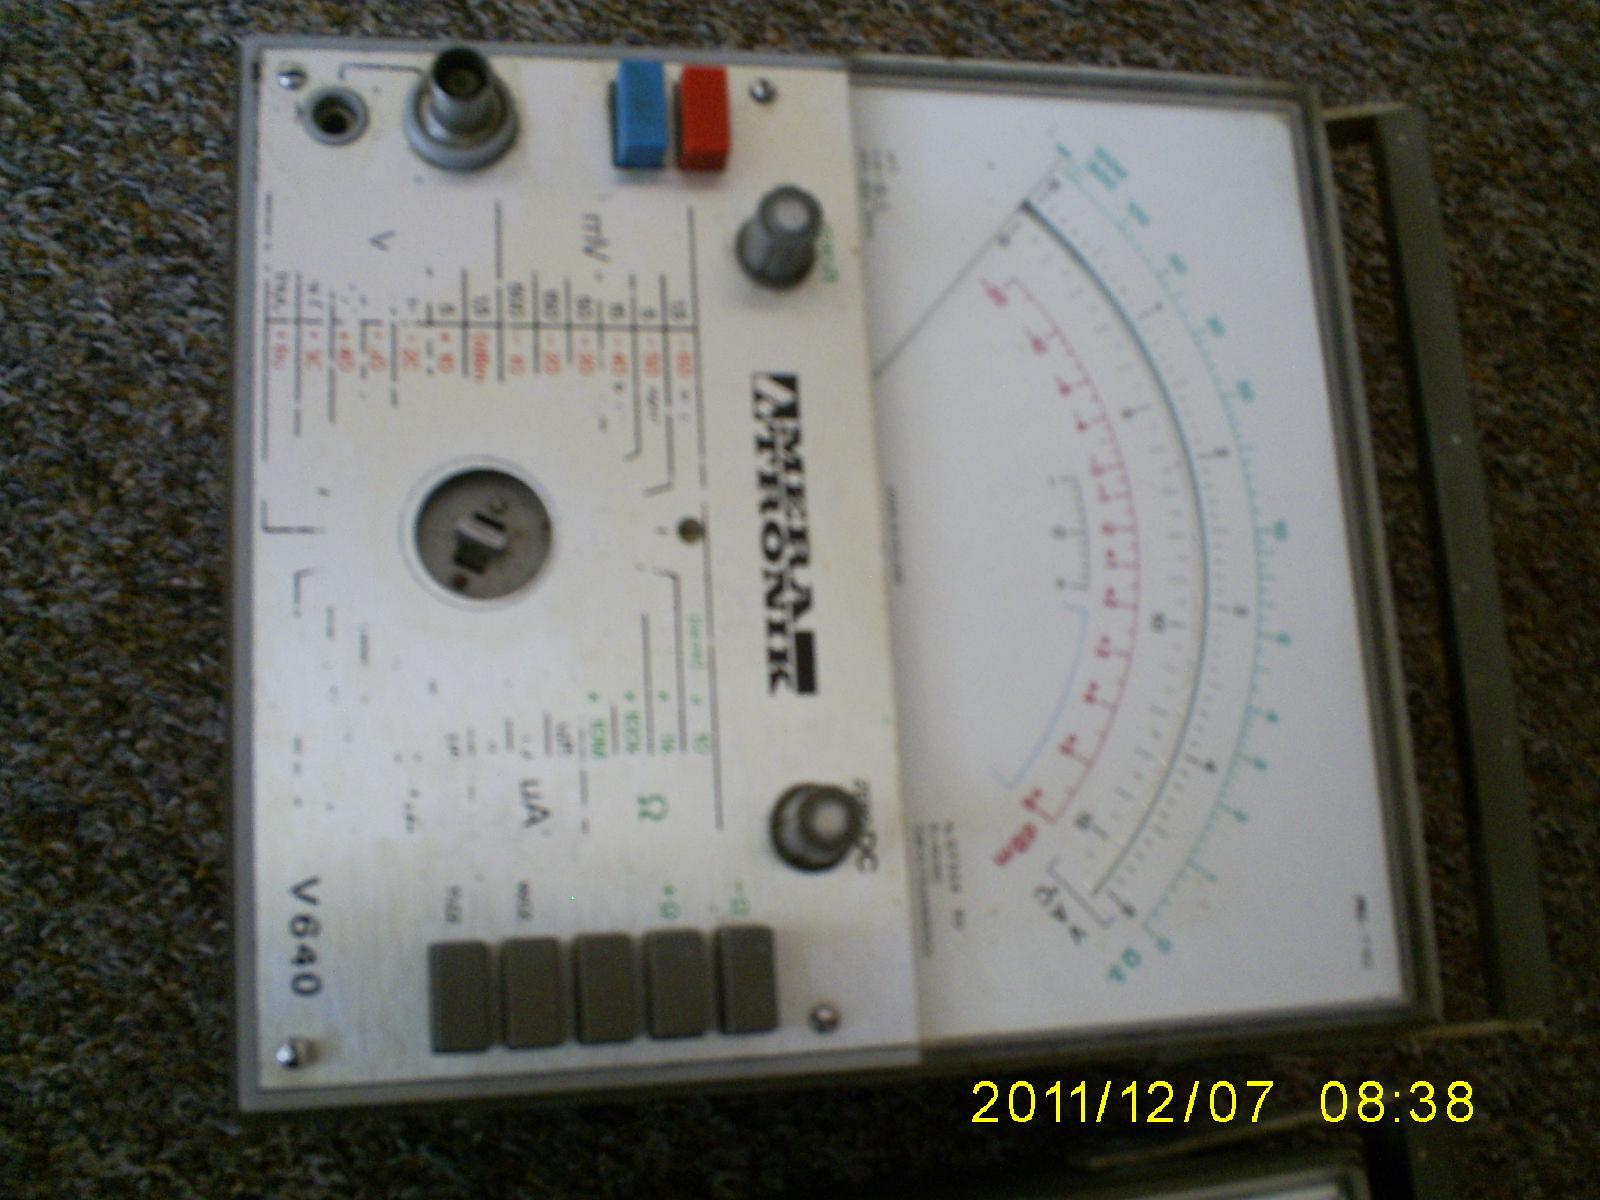 [Sprzedam] Wobulator generator, multimetry, inne